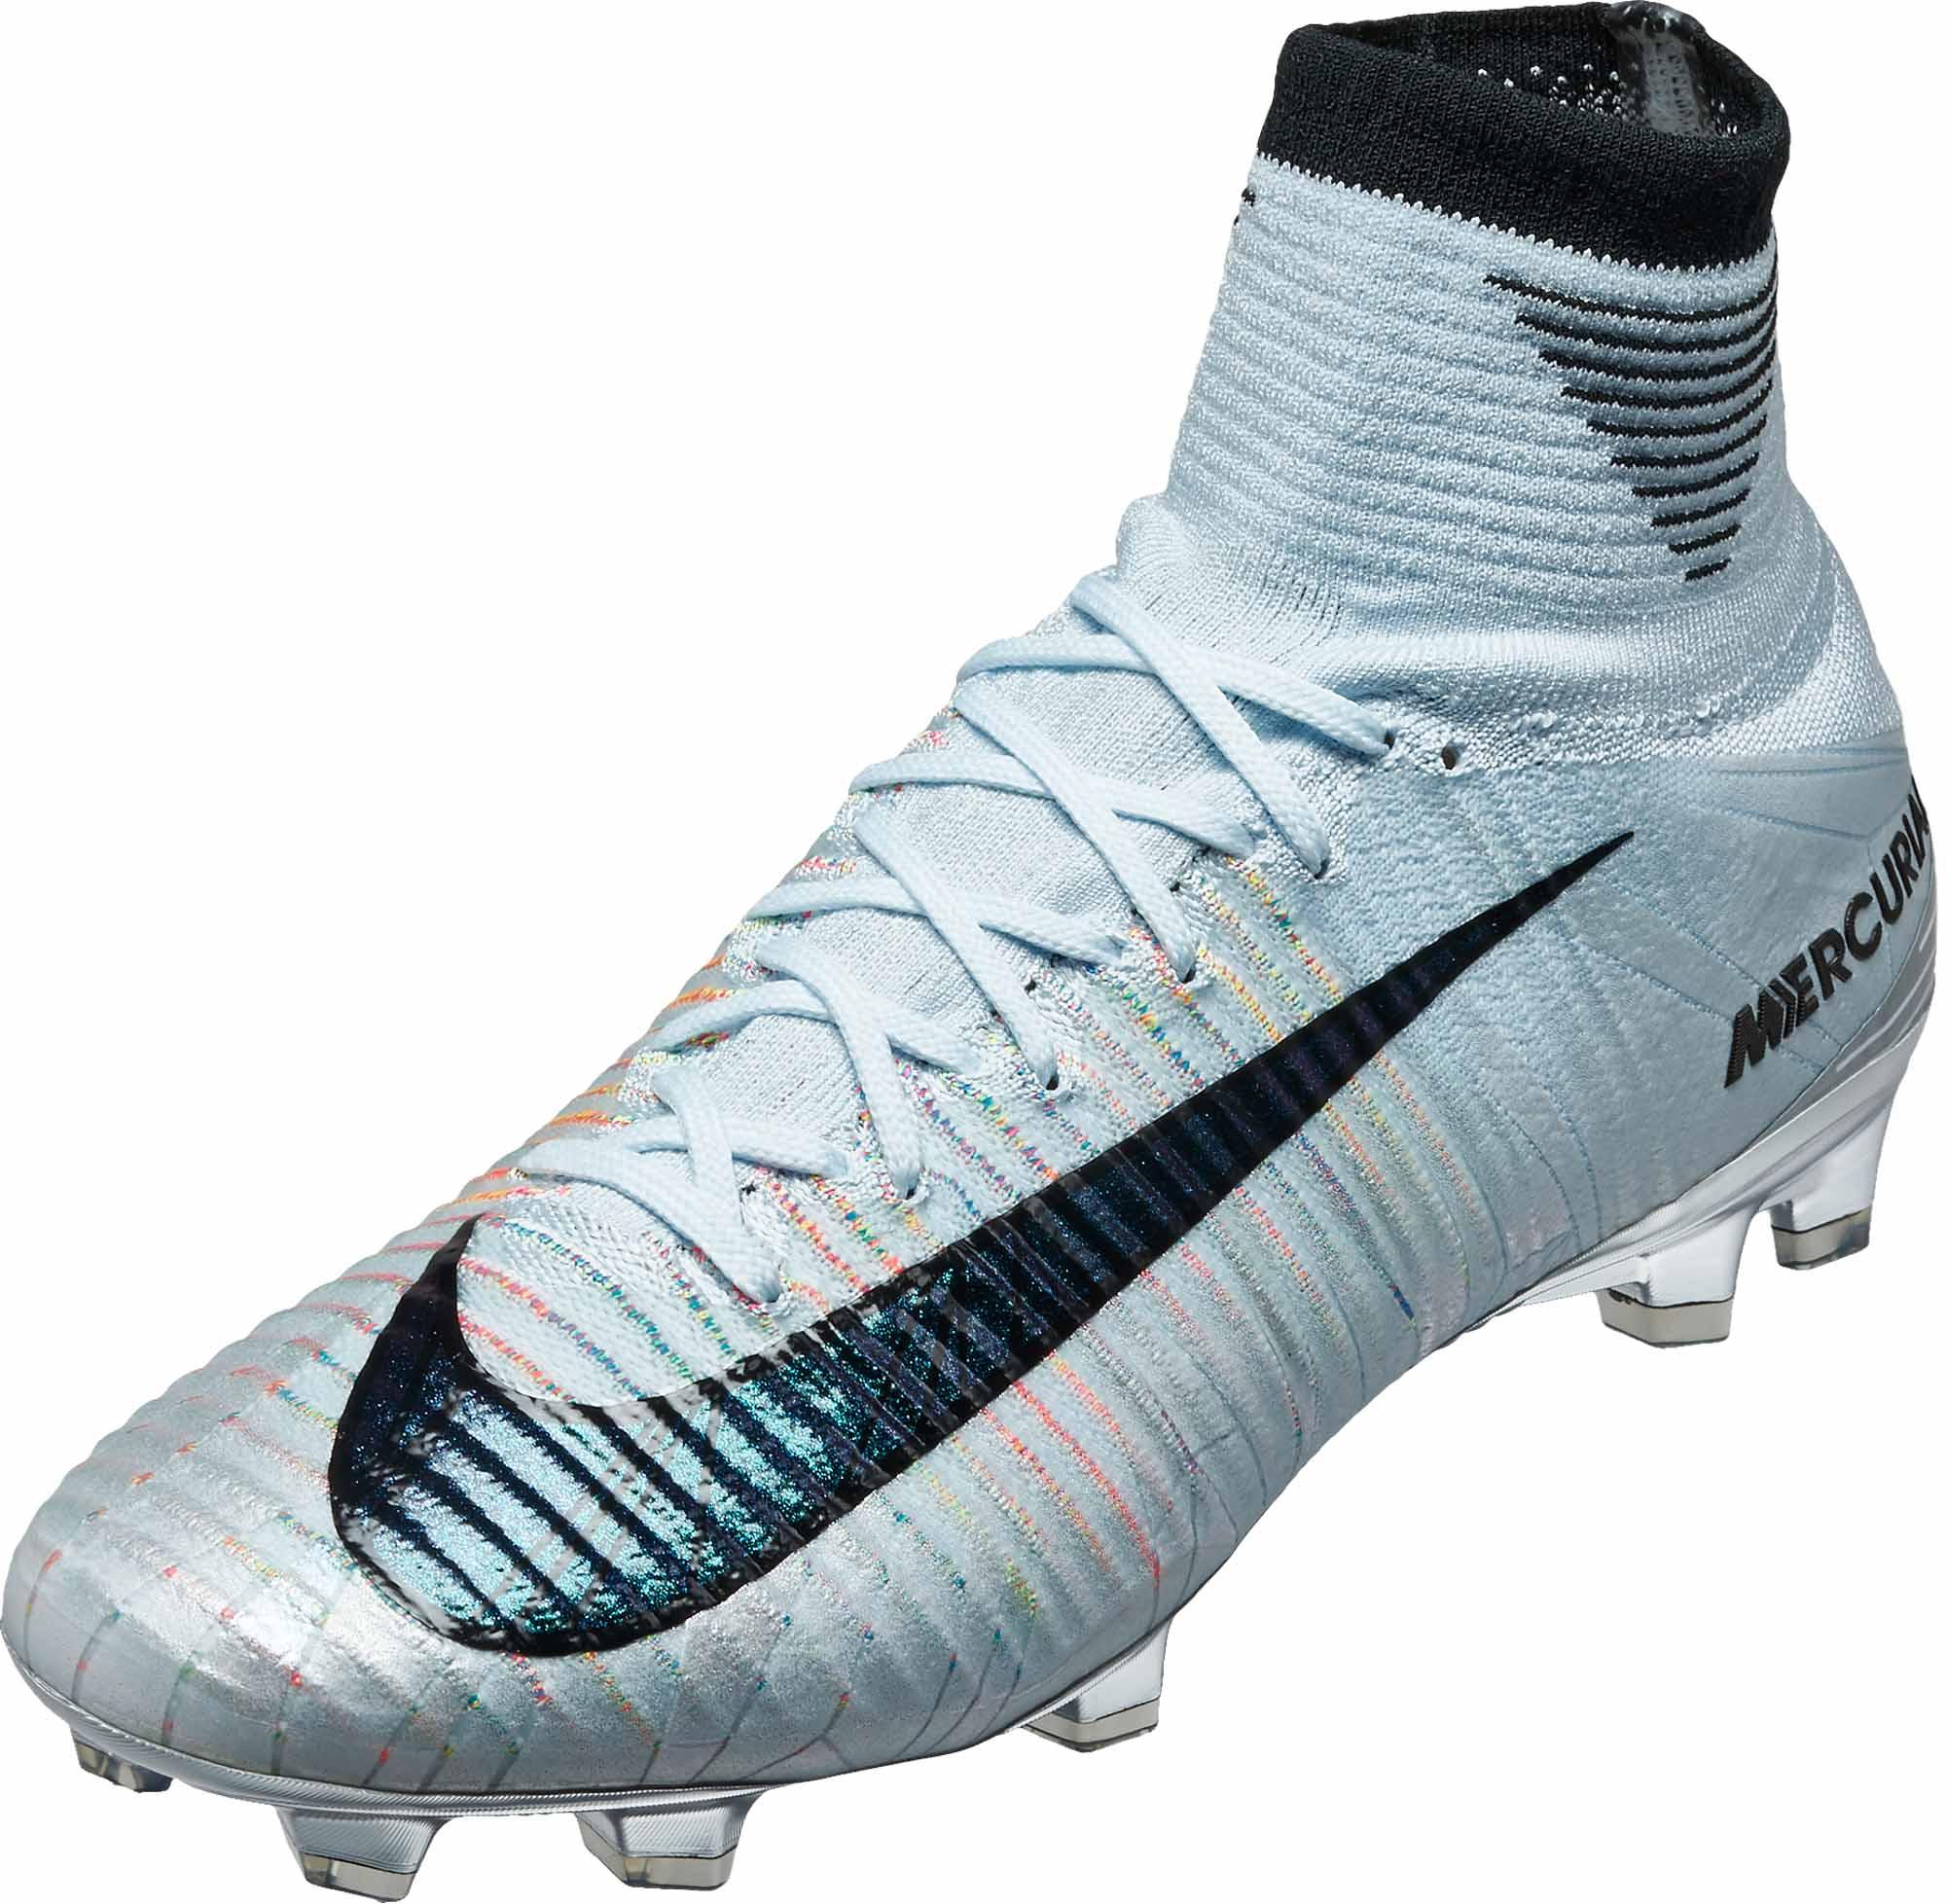 best sneakers cdd26 db51c Nike Mercurial Superfly V FG - CR7 Melhor - Blue Tint